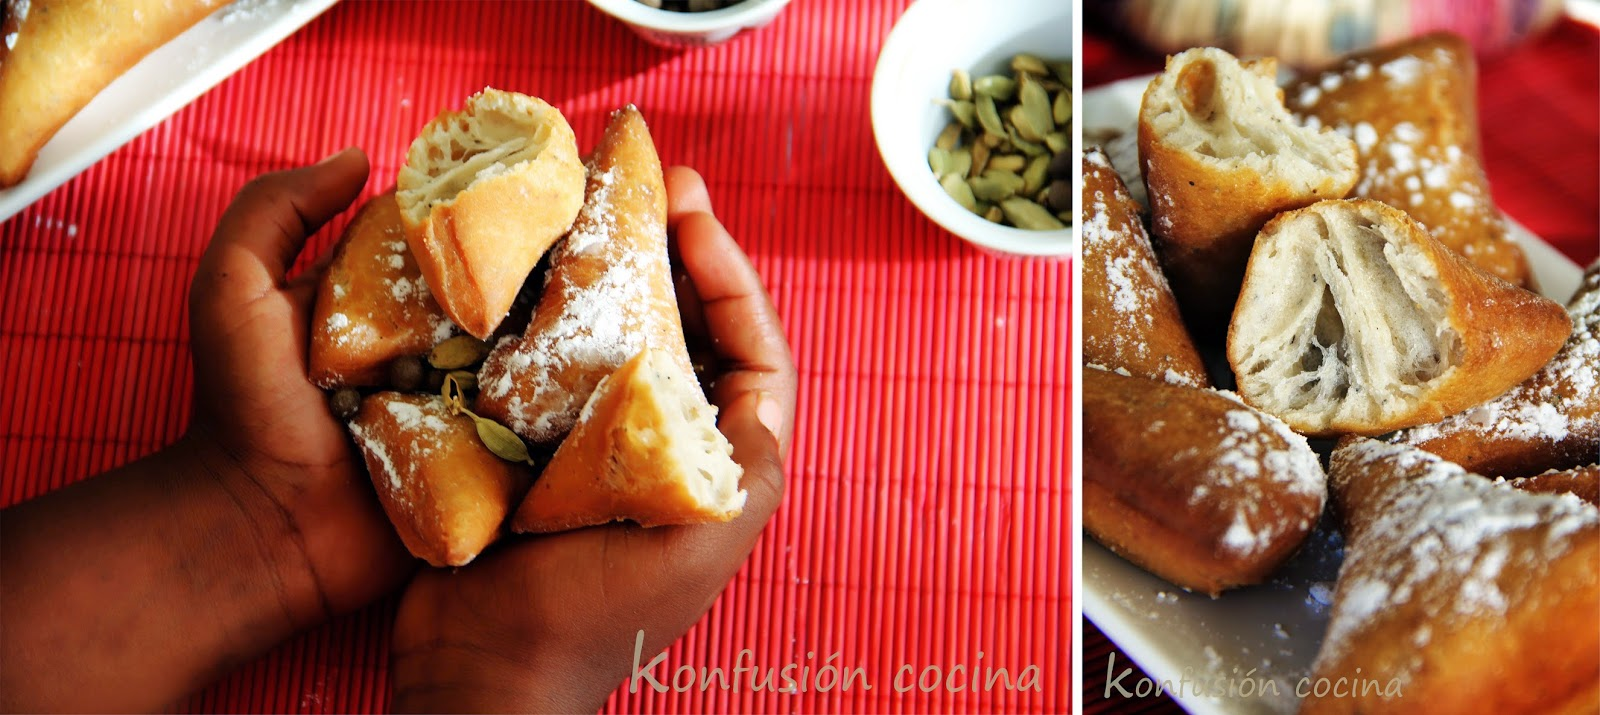 rico delicioso frito especial diferente receta